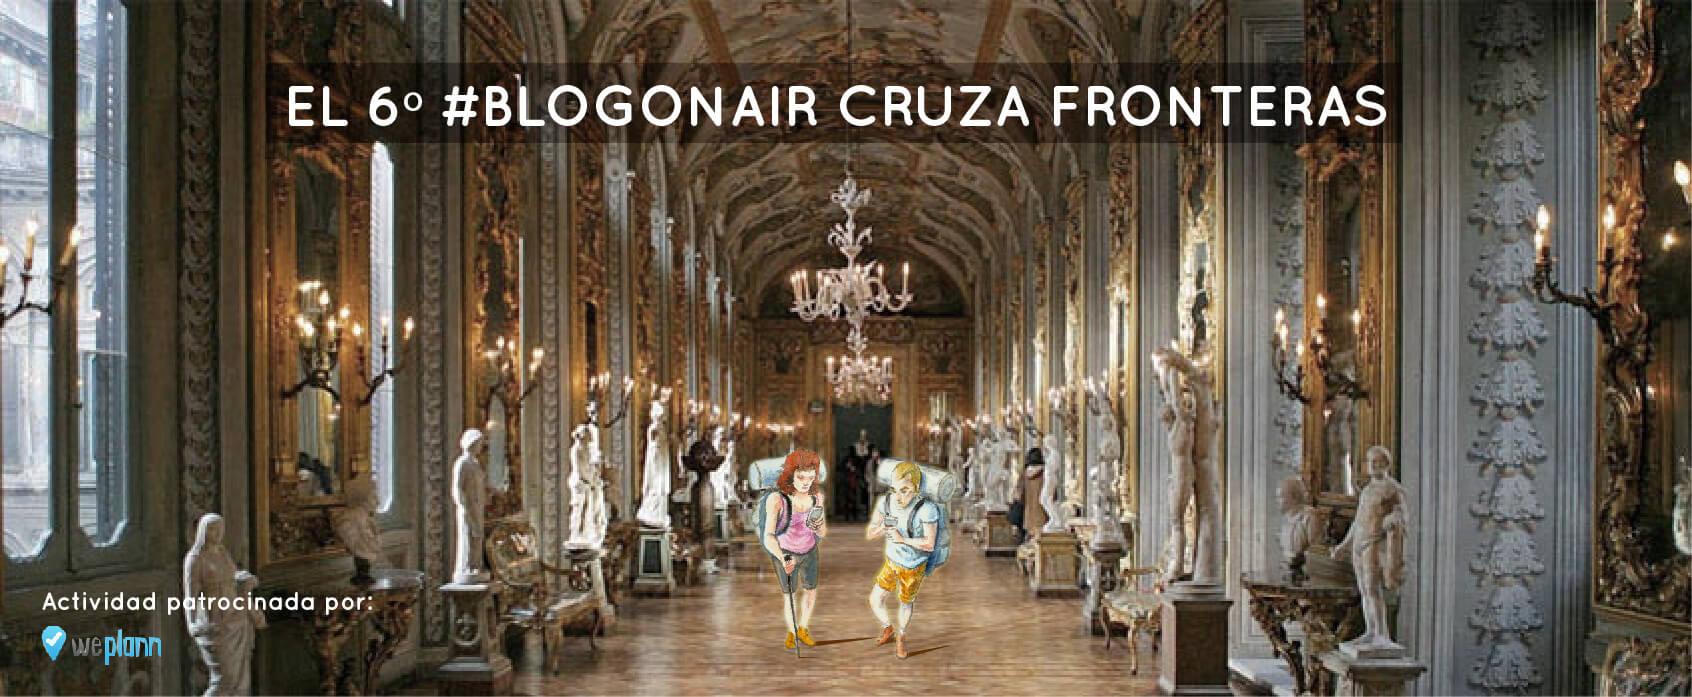 El Sexto #blogonair Sale De España